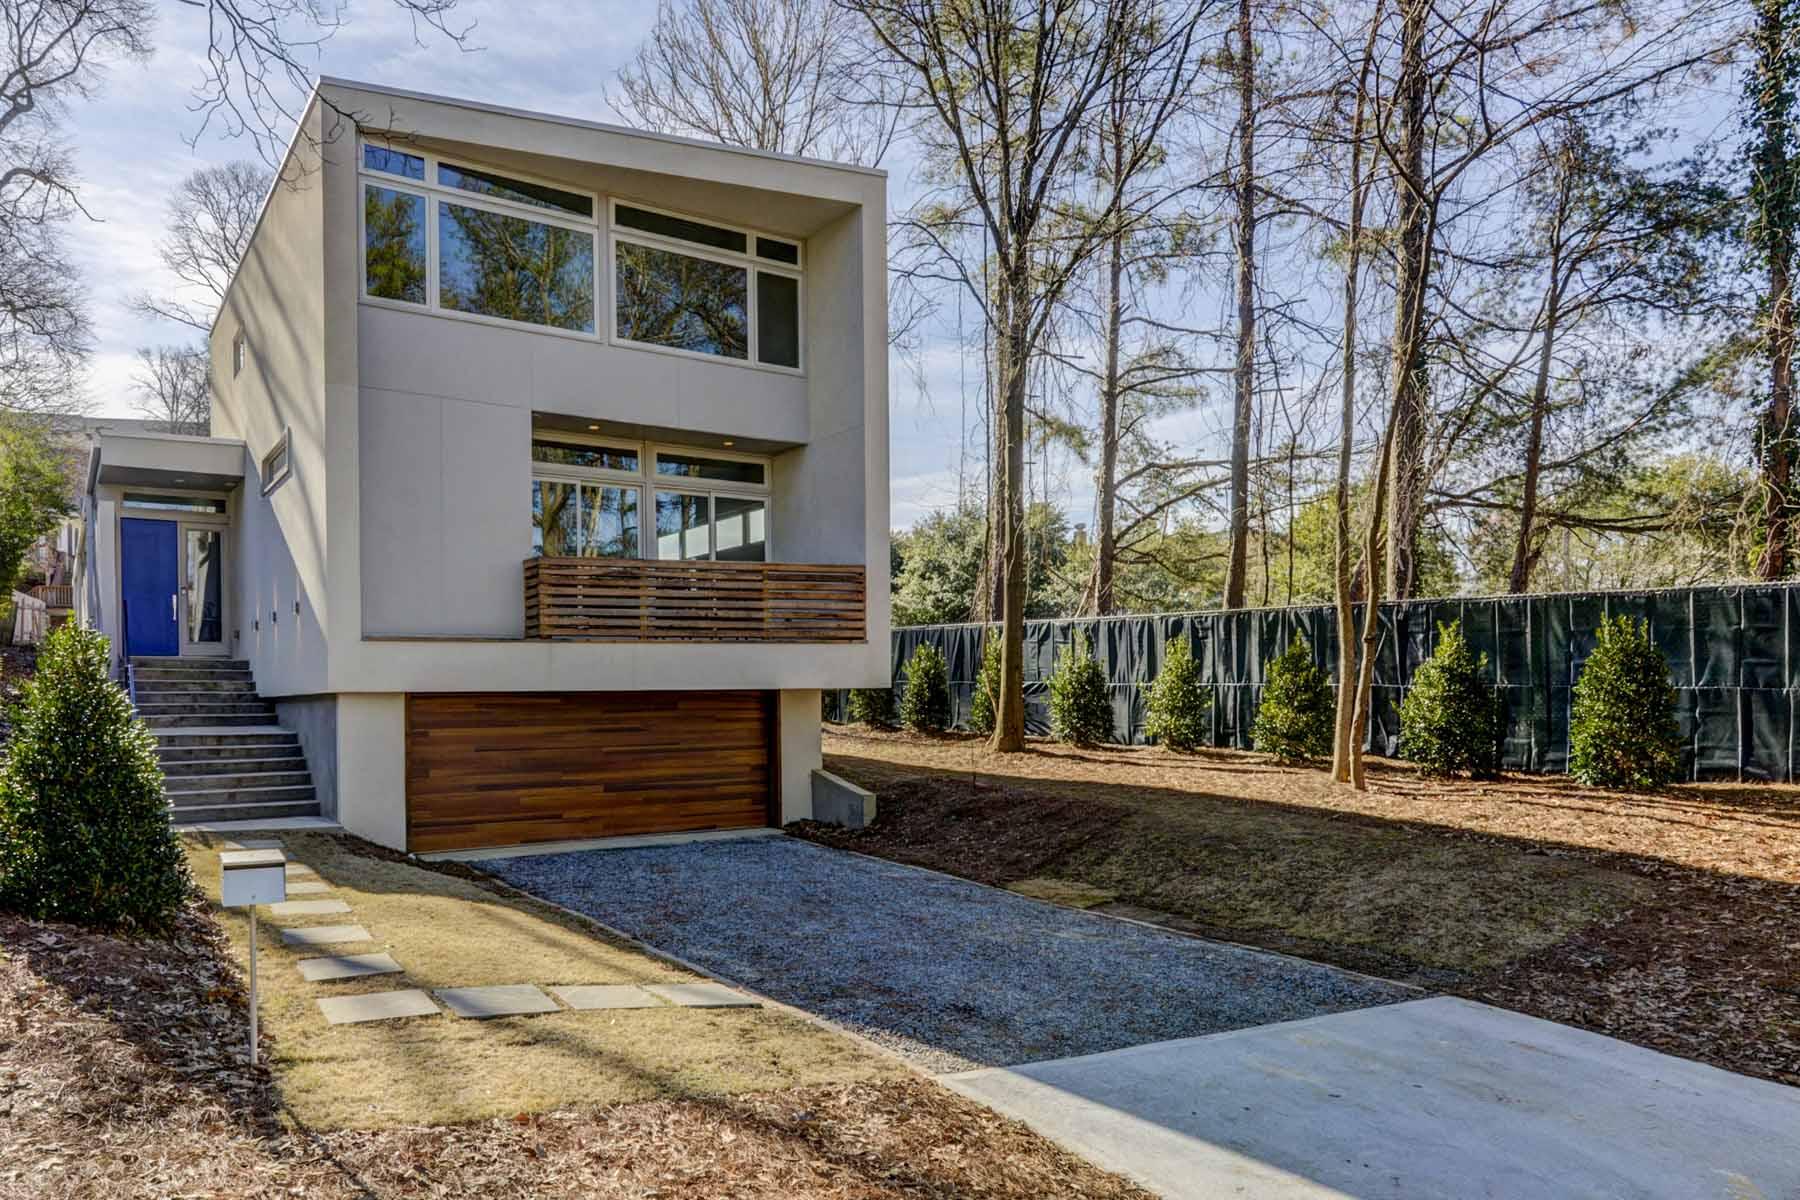 Nhà ở một gia đình vì Bán tại Designer Home Steps from the Beltline and Ponce City Market 811 Belgrade Avenue NE Poncey Highland, Atlanta, Georgia, 30306 Hoa Kỳ